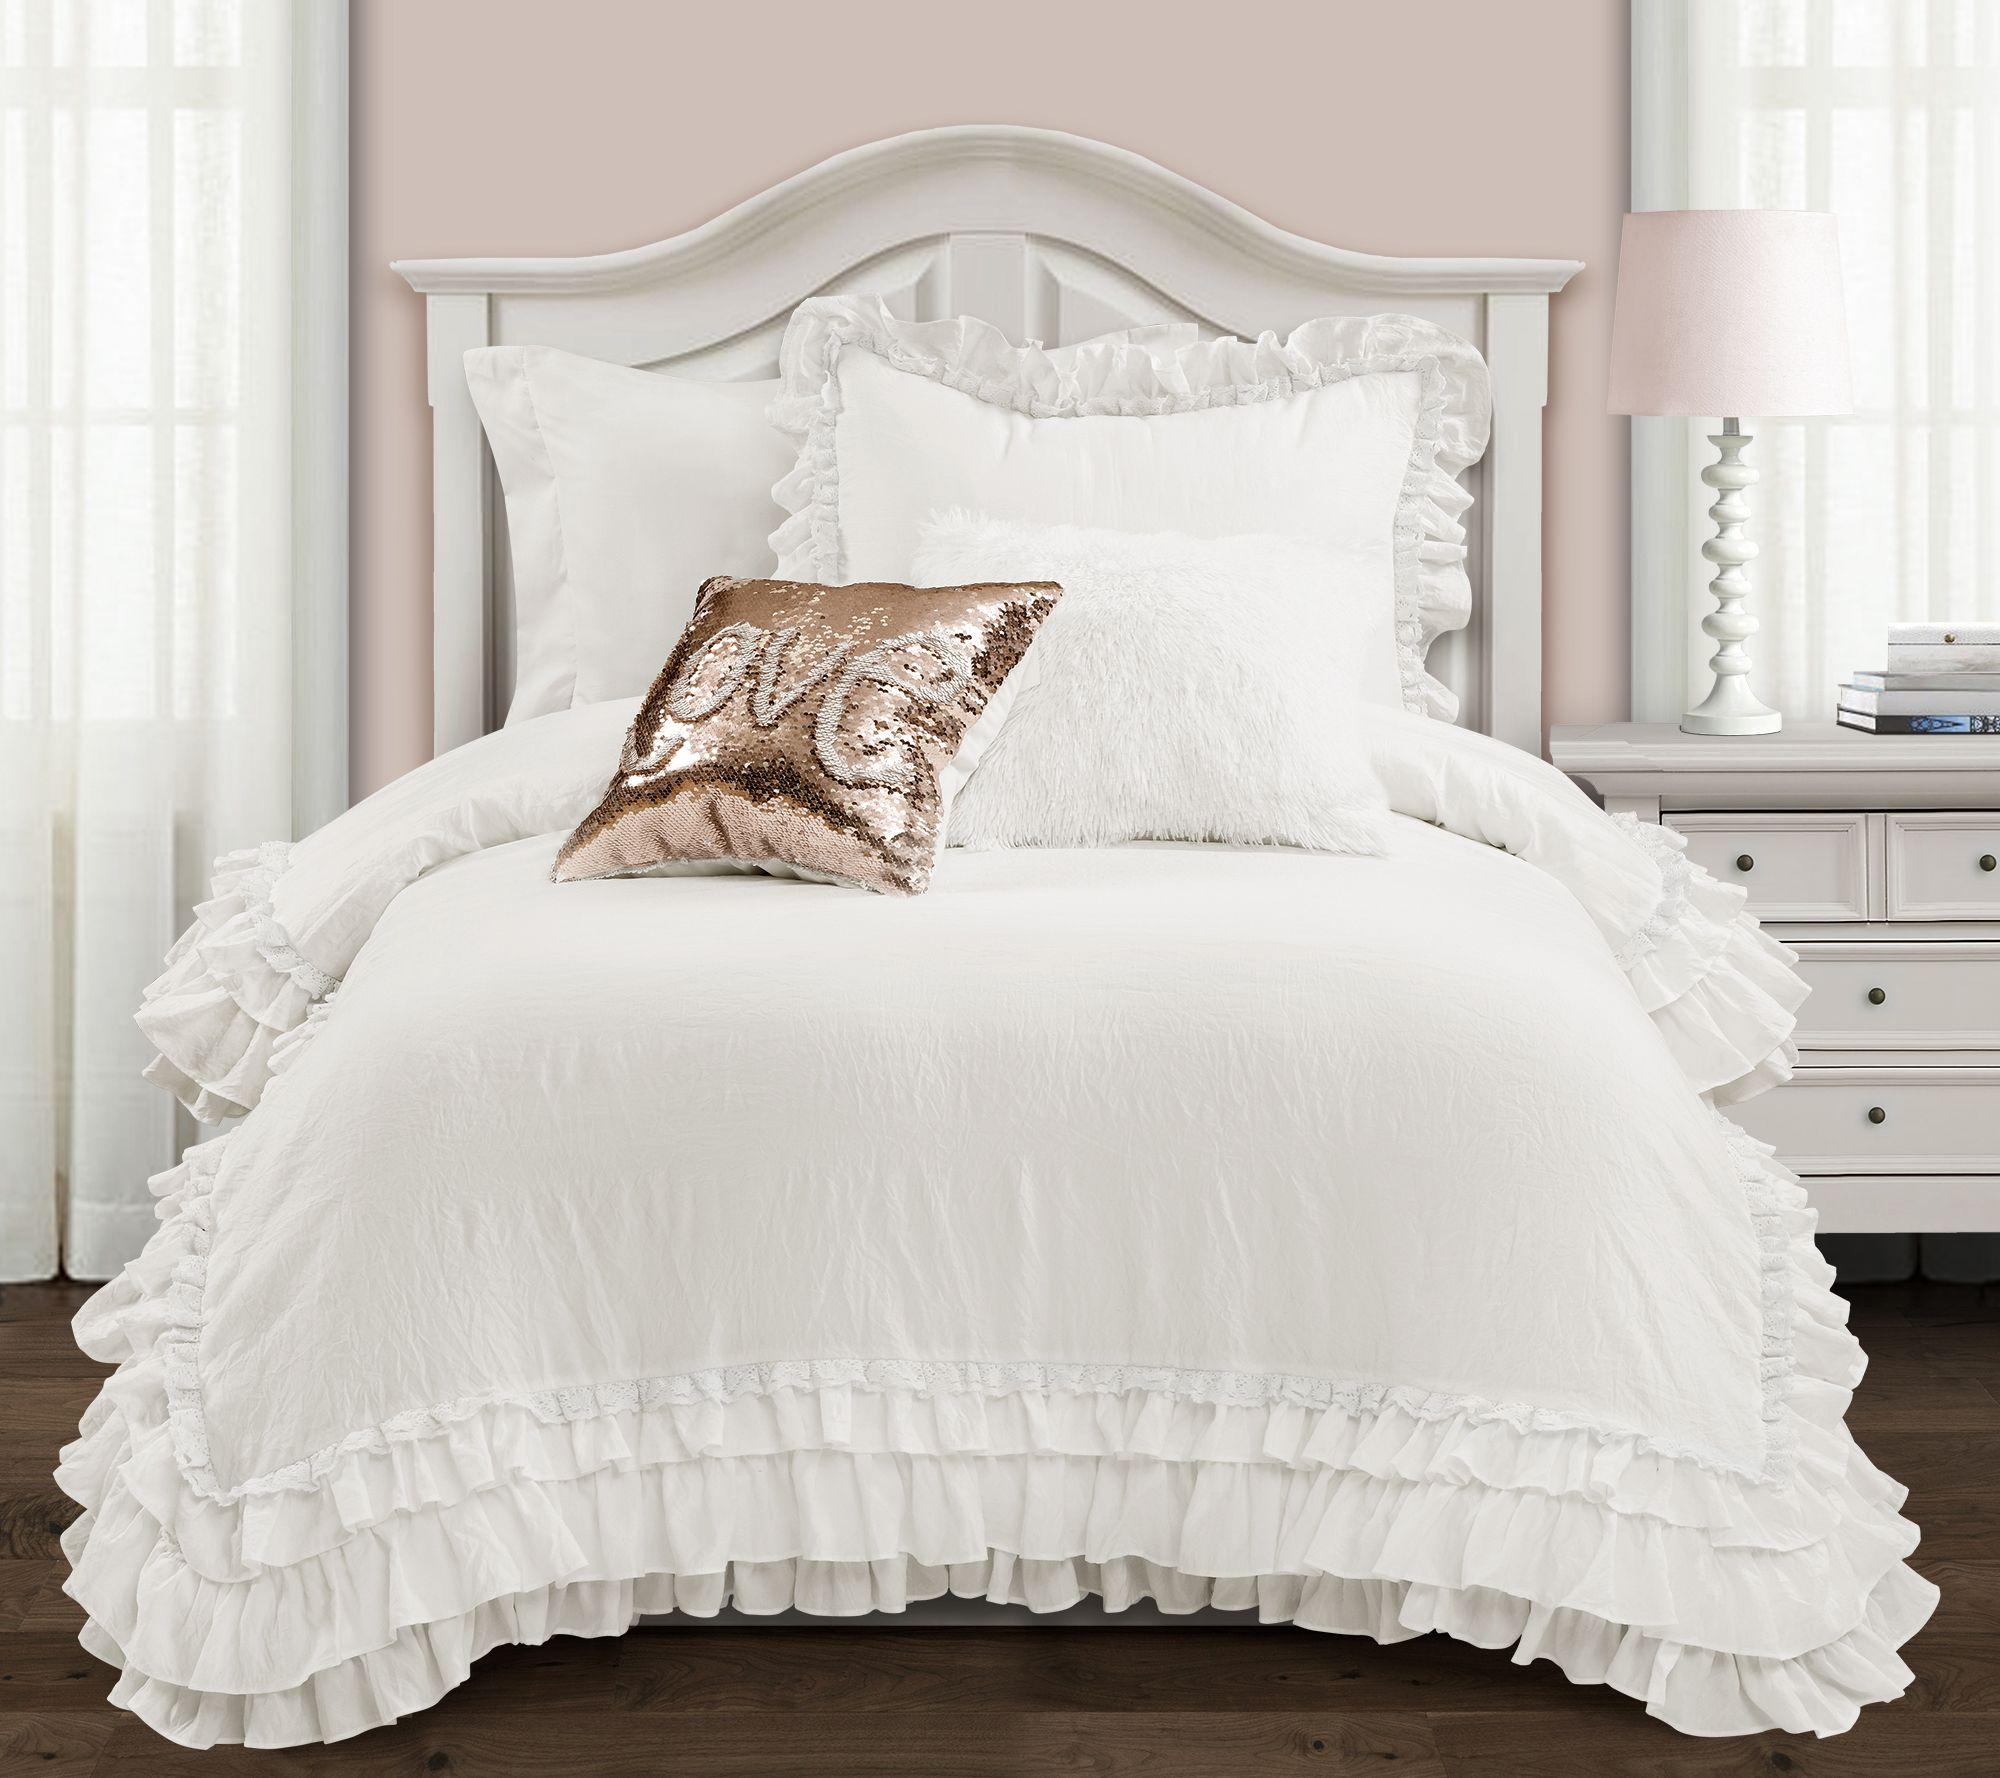 5pc Teen Girl Ruffles Layered Shabby White Ruffled Full Queen Comforter Set Comforters Bedding Sets Home Garden